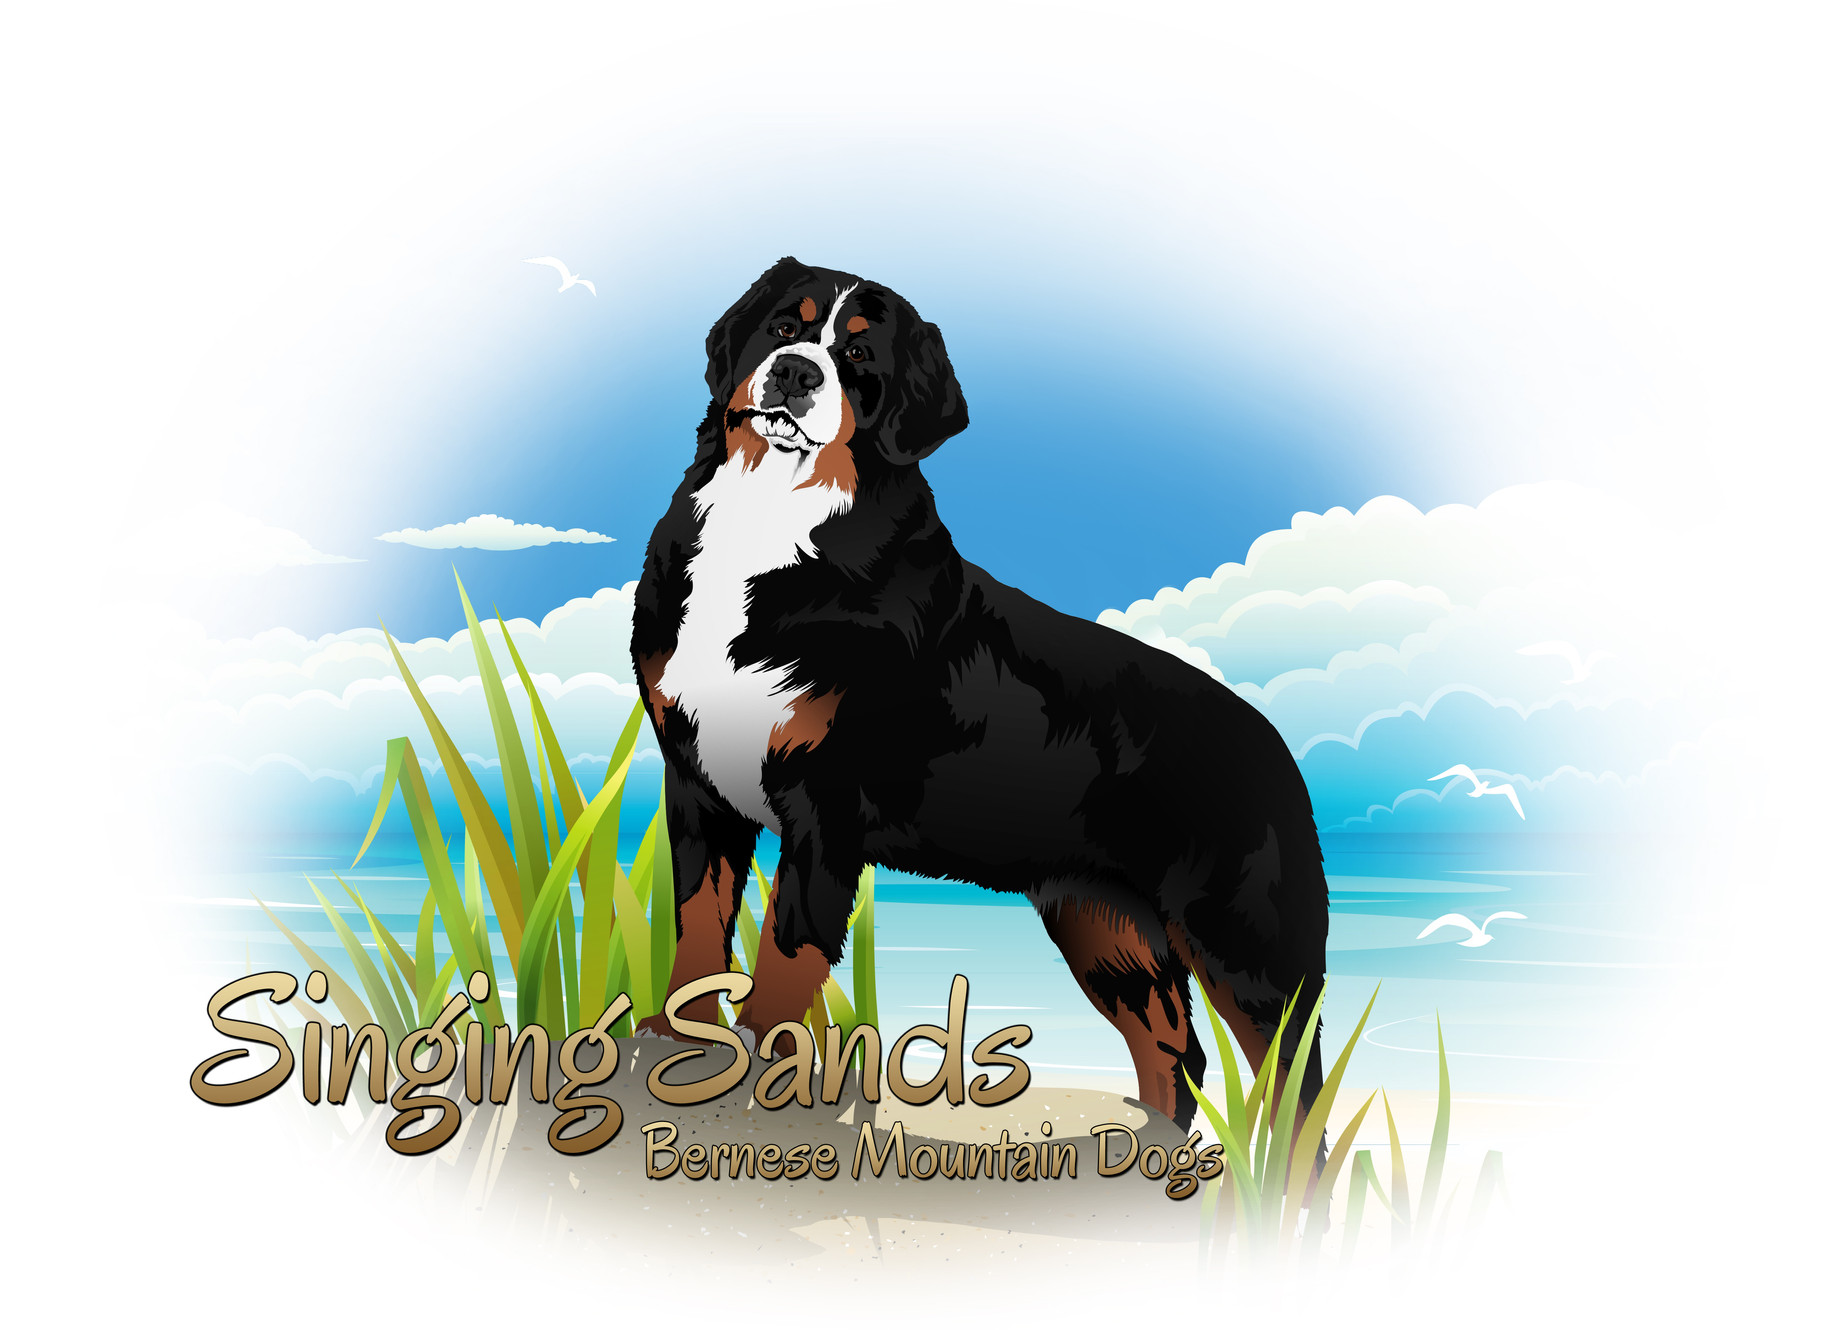 Singing Sands Bernese mountain dog breeders Northwest